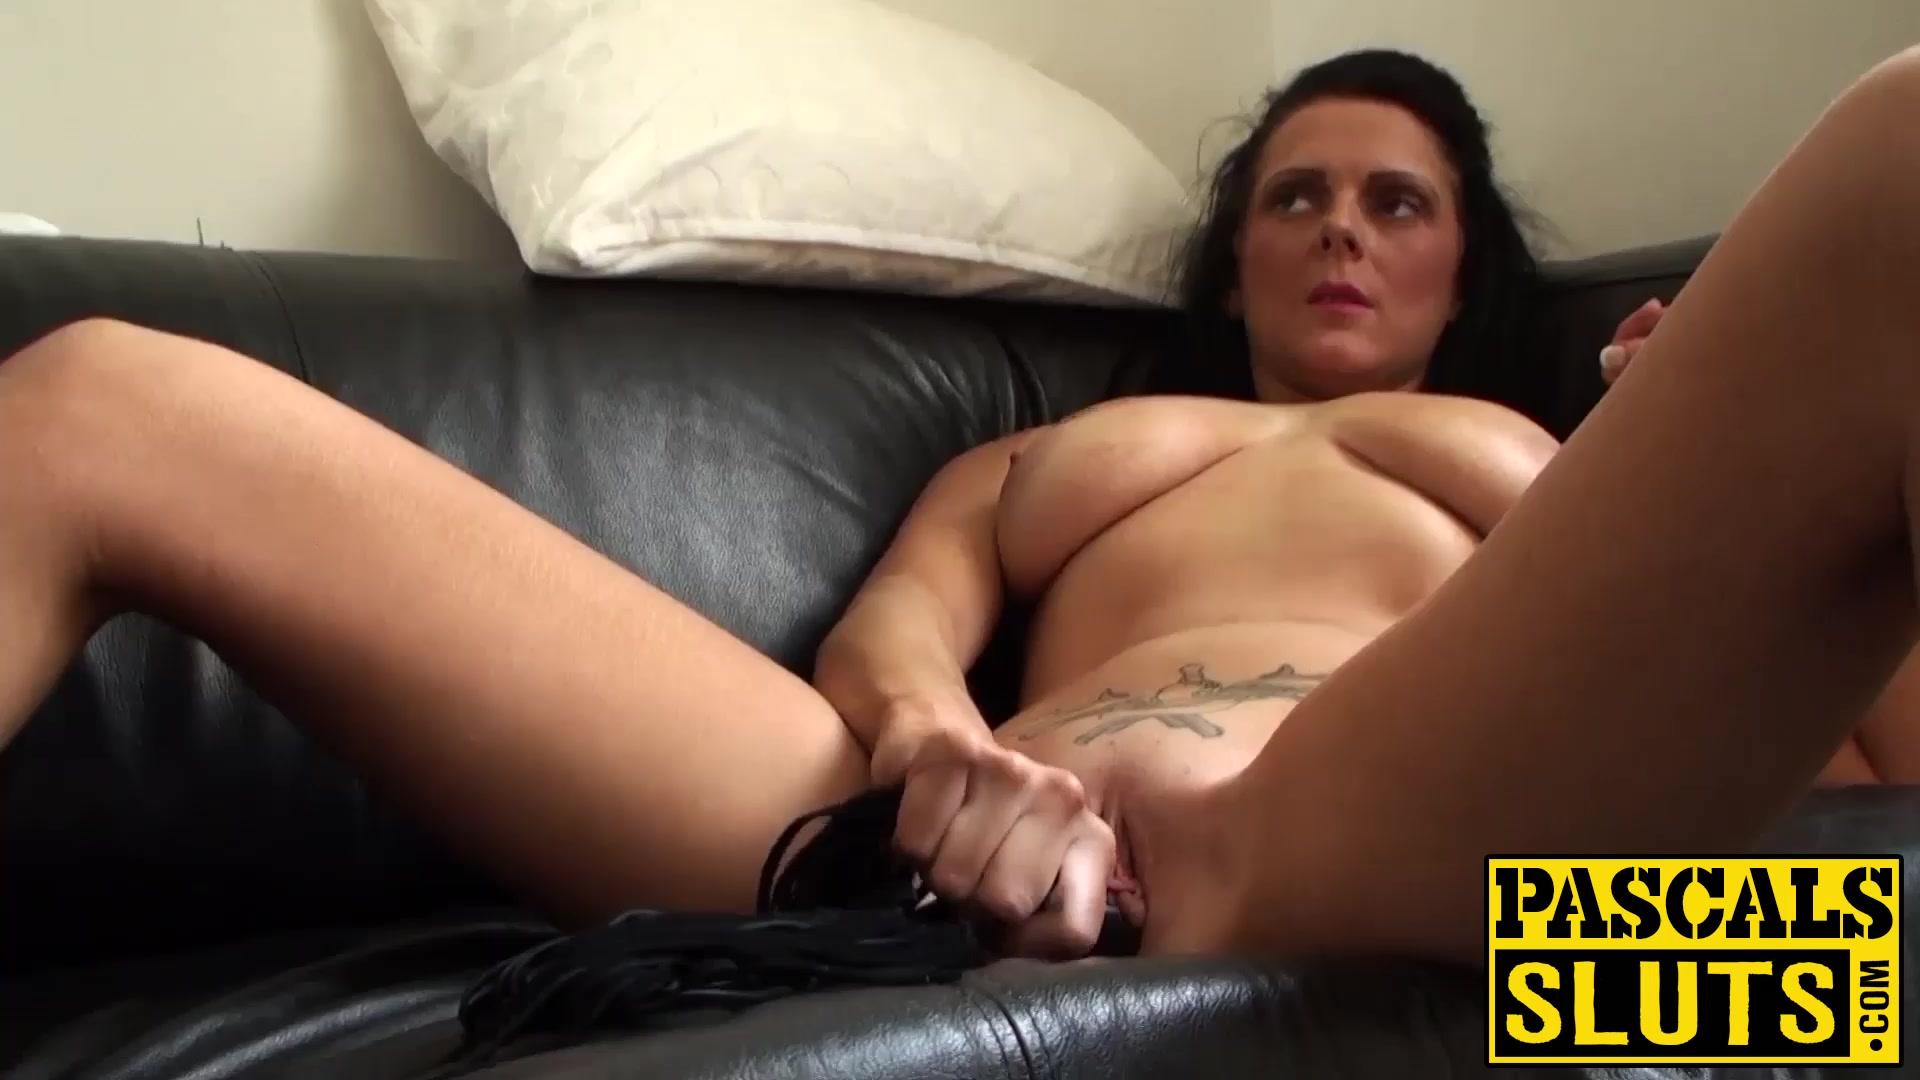 Sexy pics of bianca kajlich Nude pics